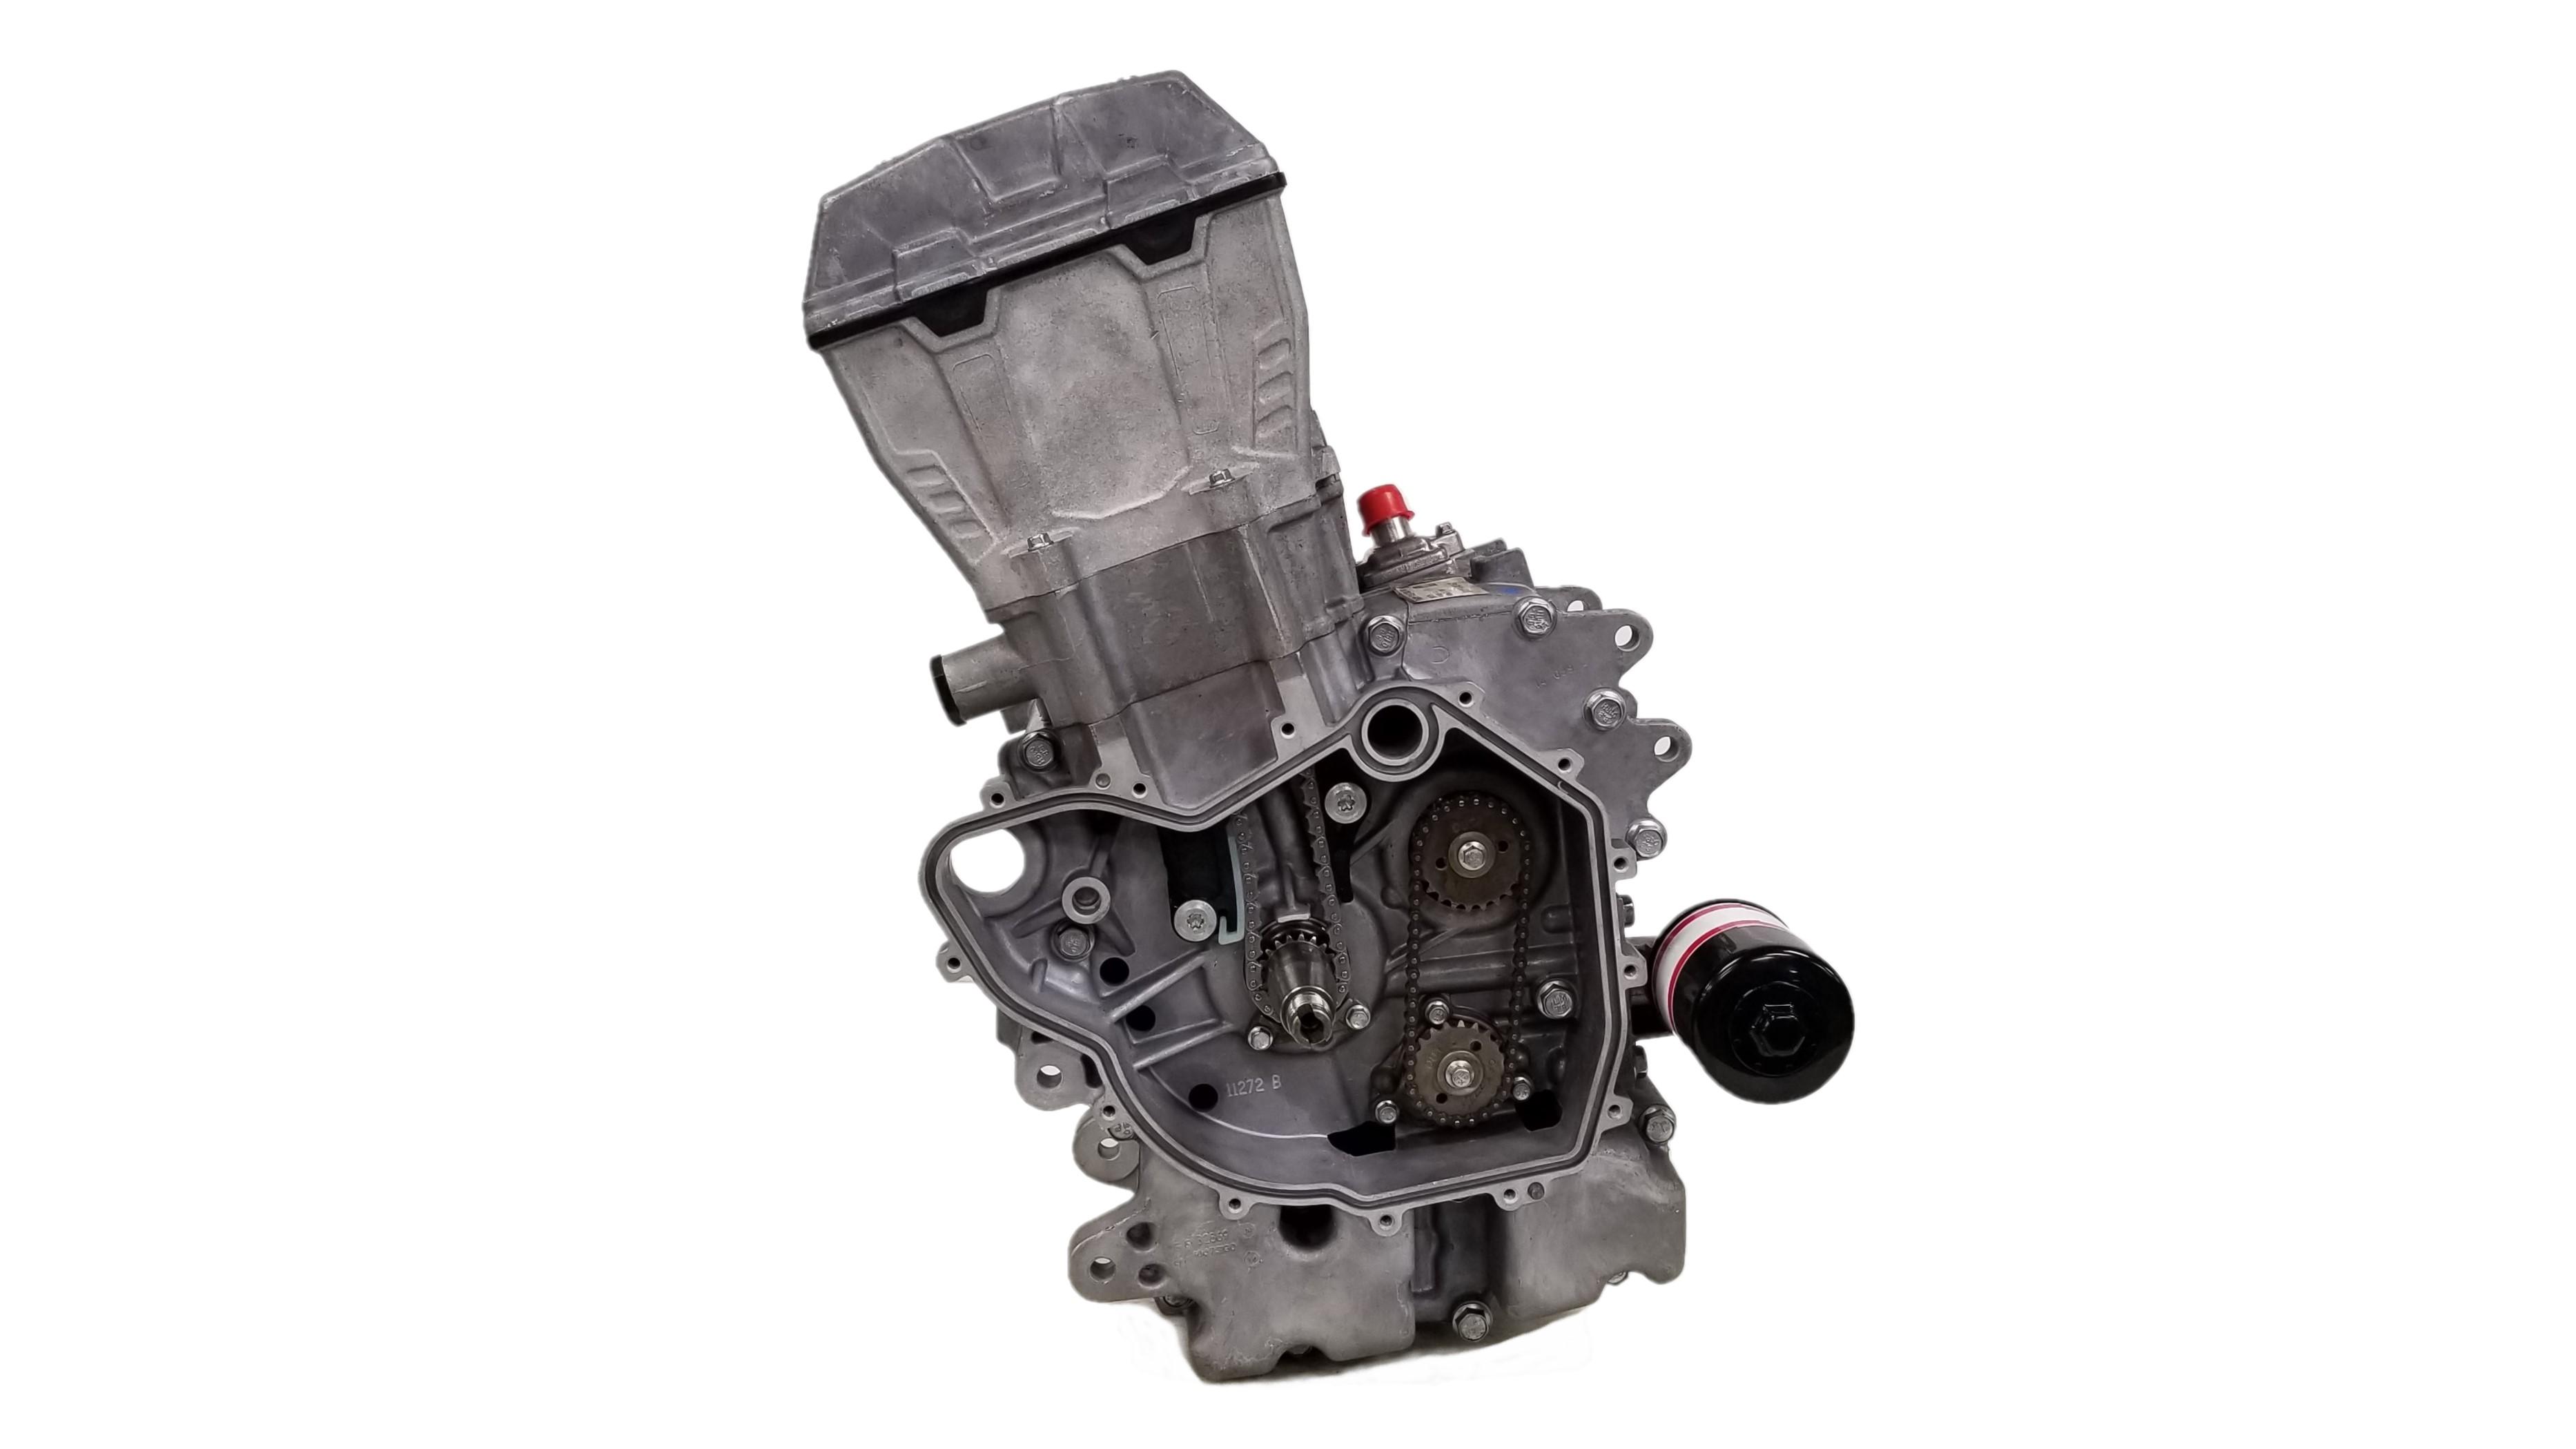 POLARIS 300 2 STROKE ENGINE COMPLETE GASKET KIT /& OIL SEALS 94-99